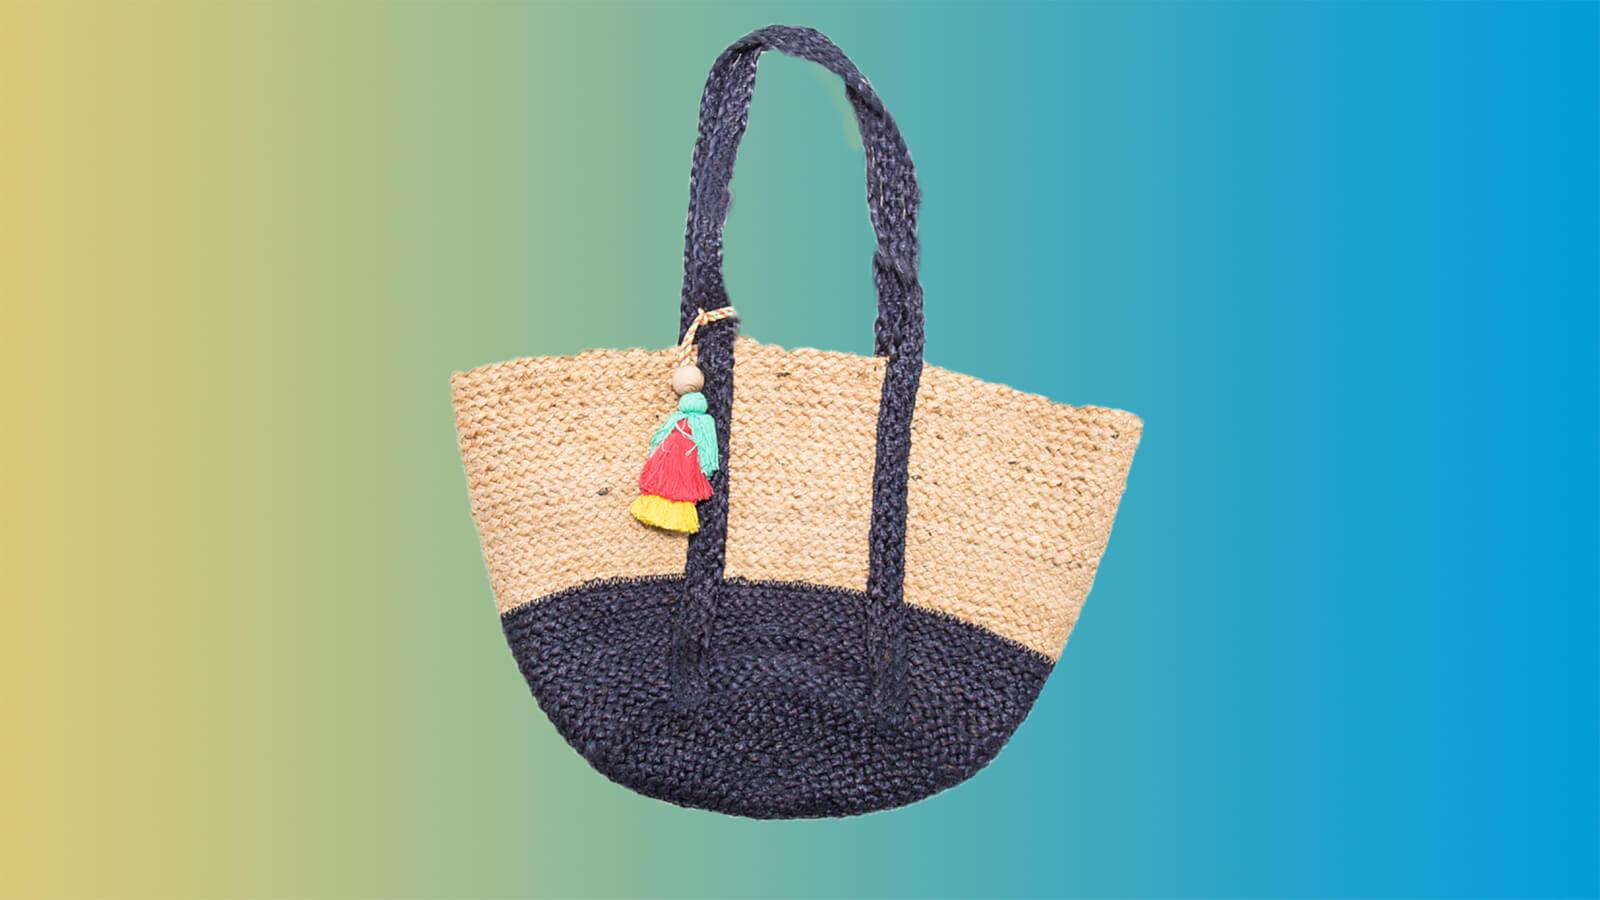 Adria tote bag for visitor center blog